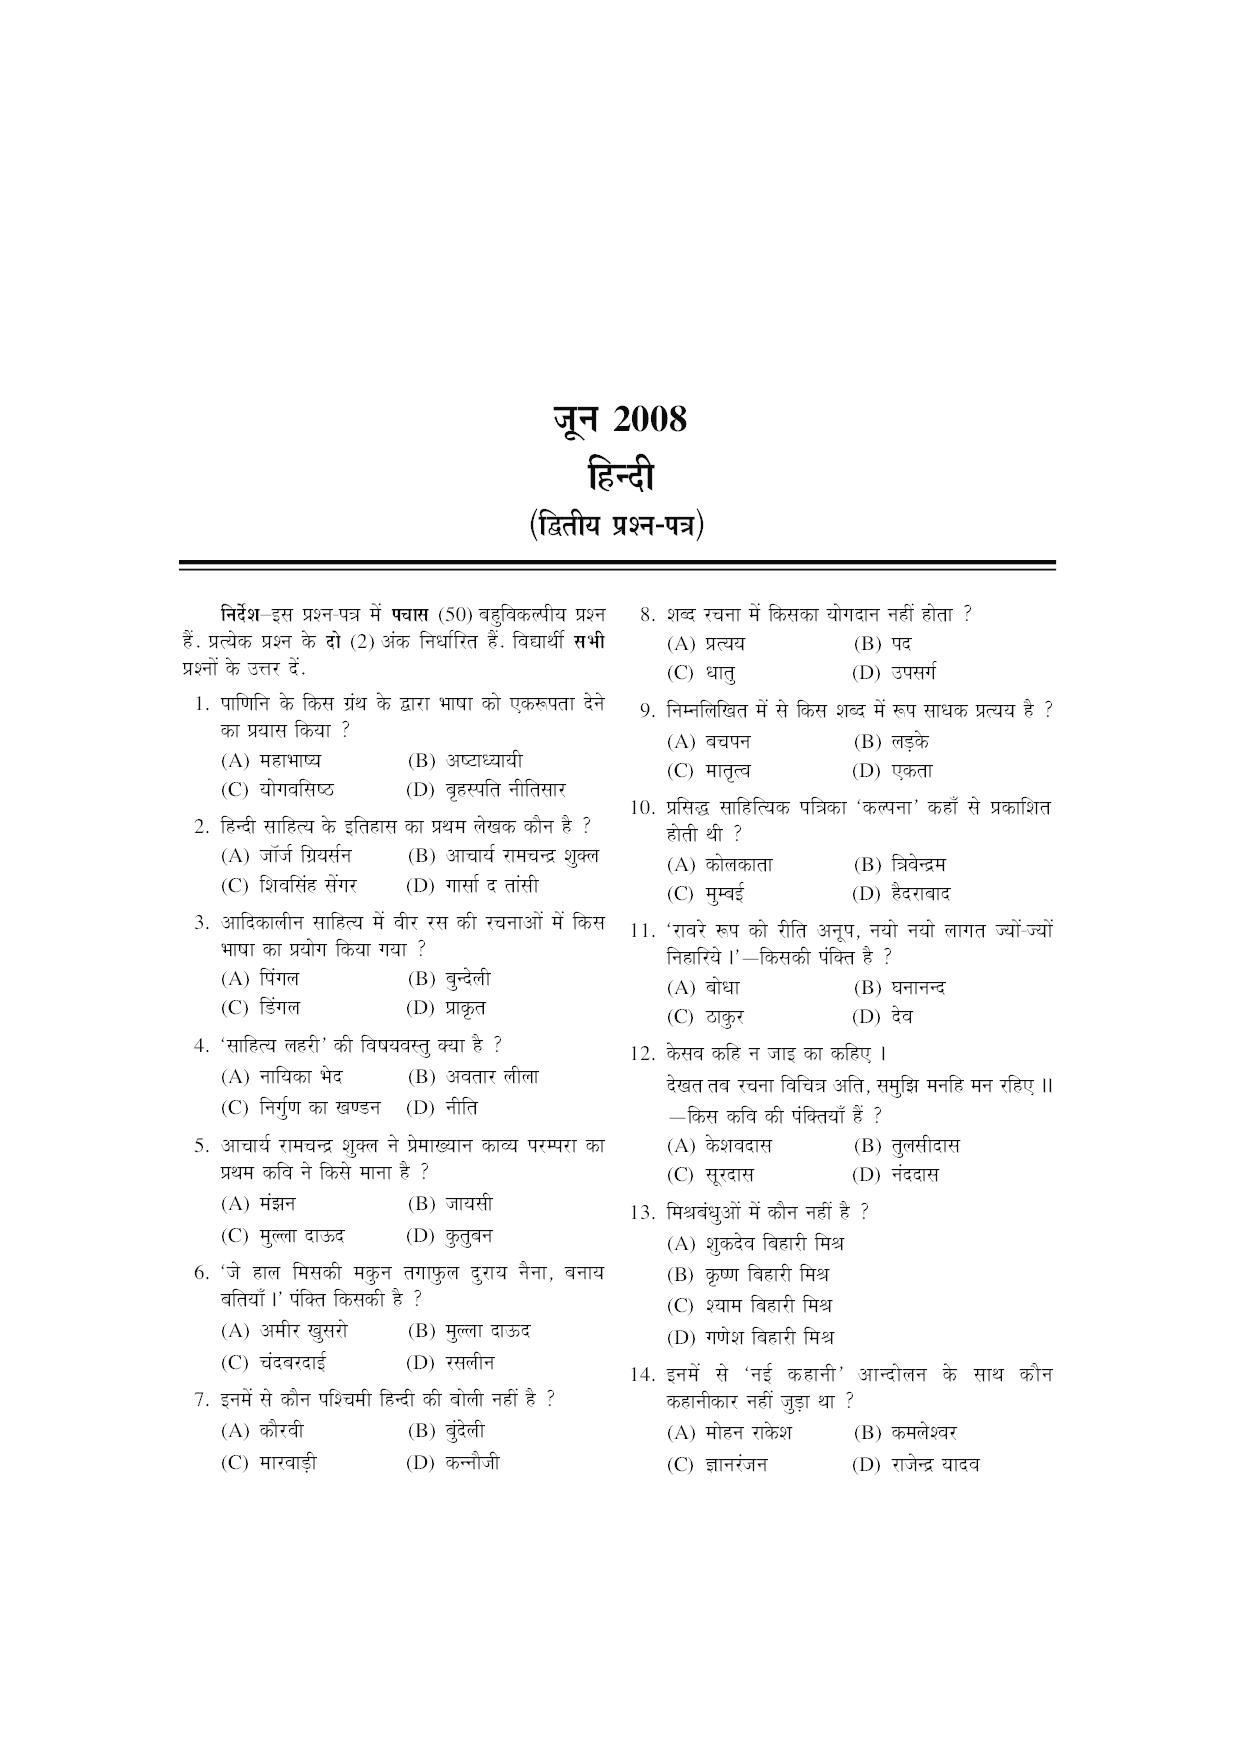 U.G.C. NET/J.R.F. परीक्षा साल्व्ड पेपर हिंदी   - Page 4